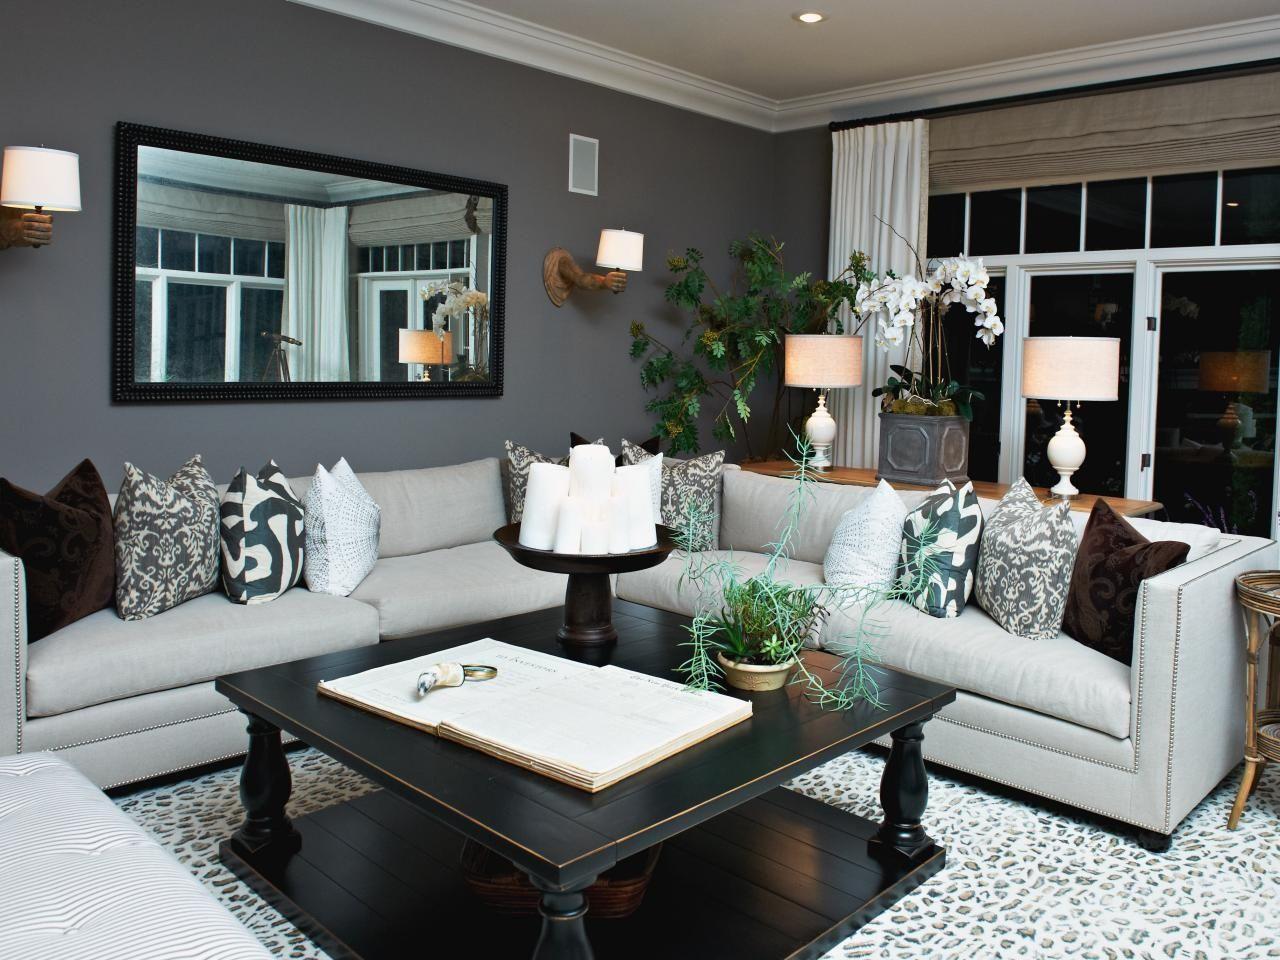 living room decoration ideas elegant home room decoration 19 incredible living decor ideas 10 cozy RMIXOAZ